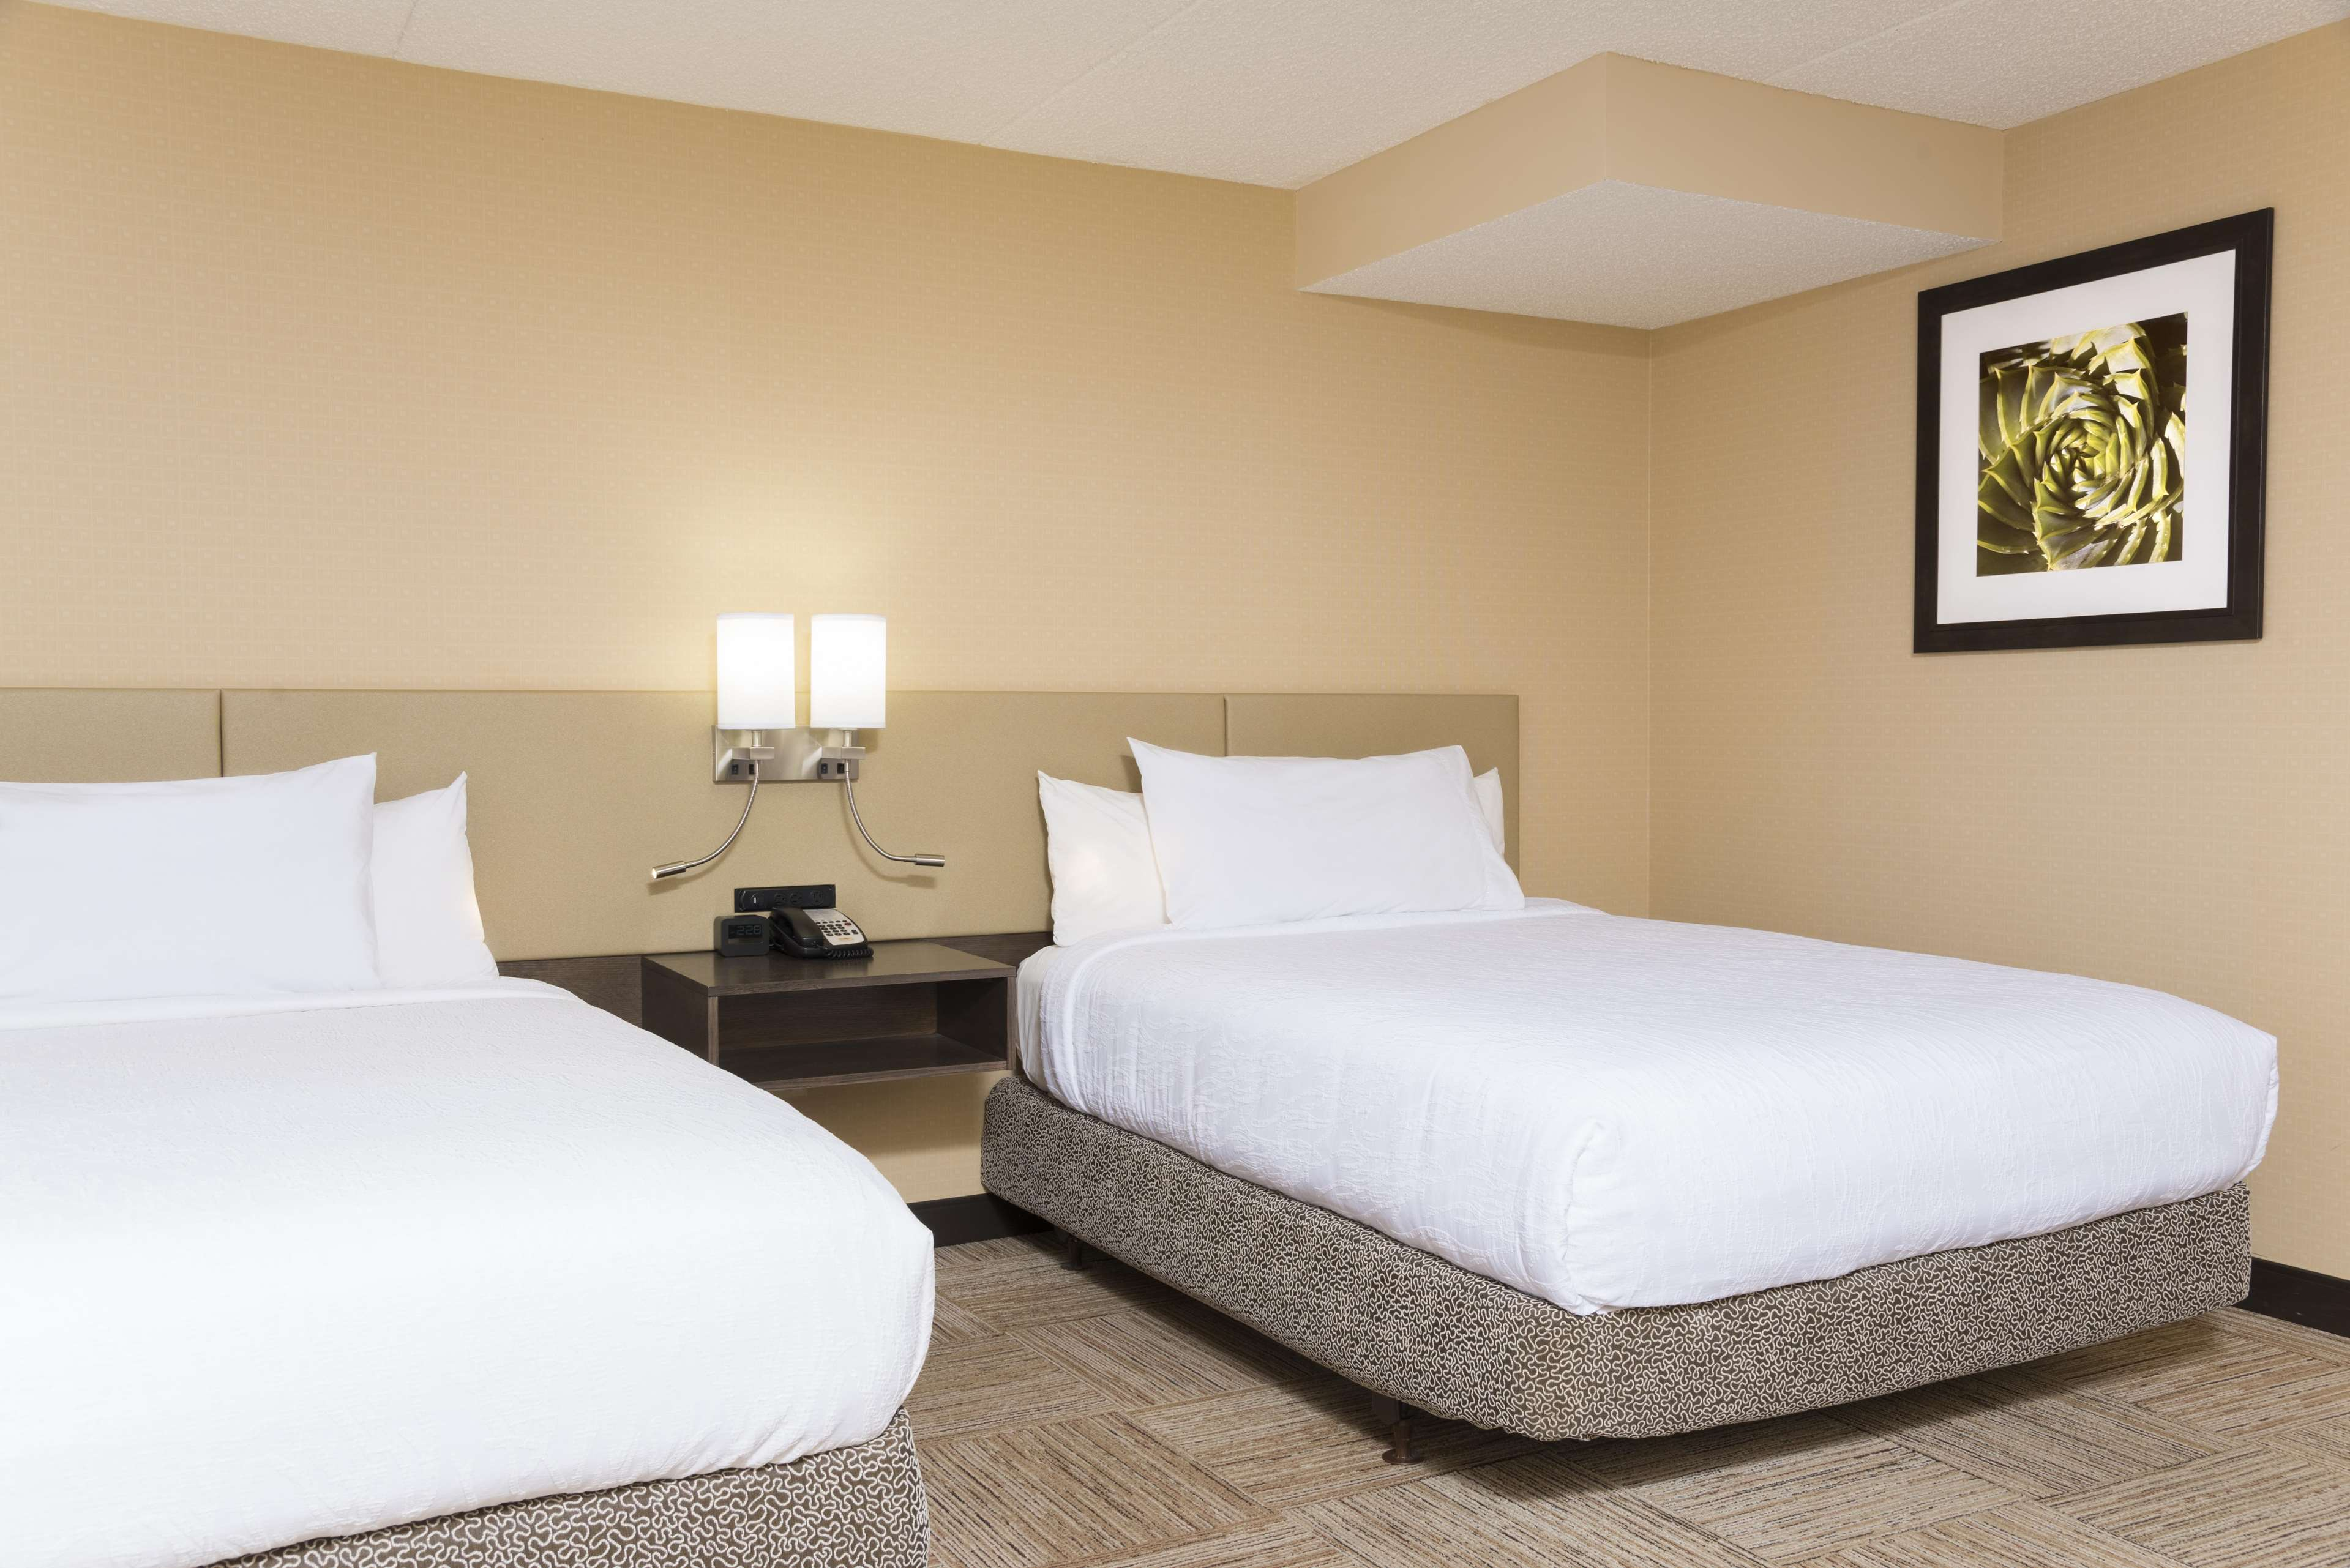 Hilton Garden Inn West Lafayette Wabash Landing image 33